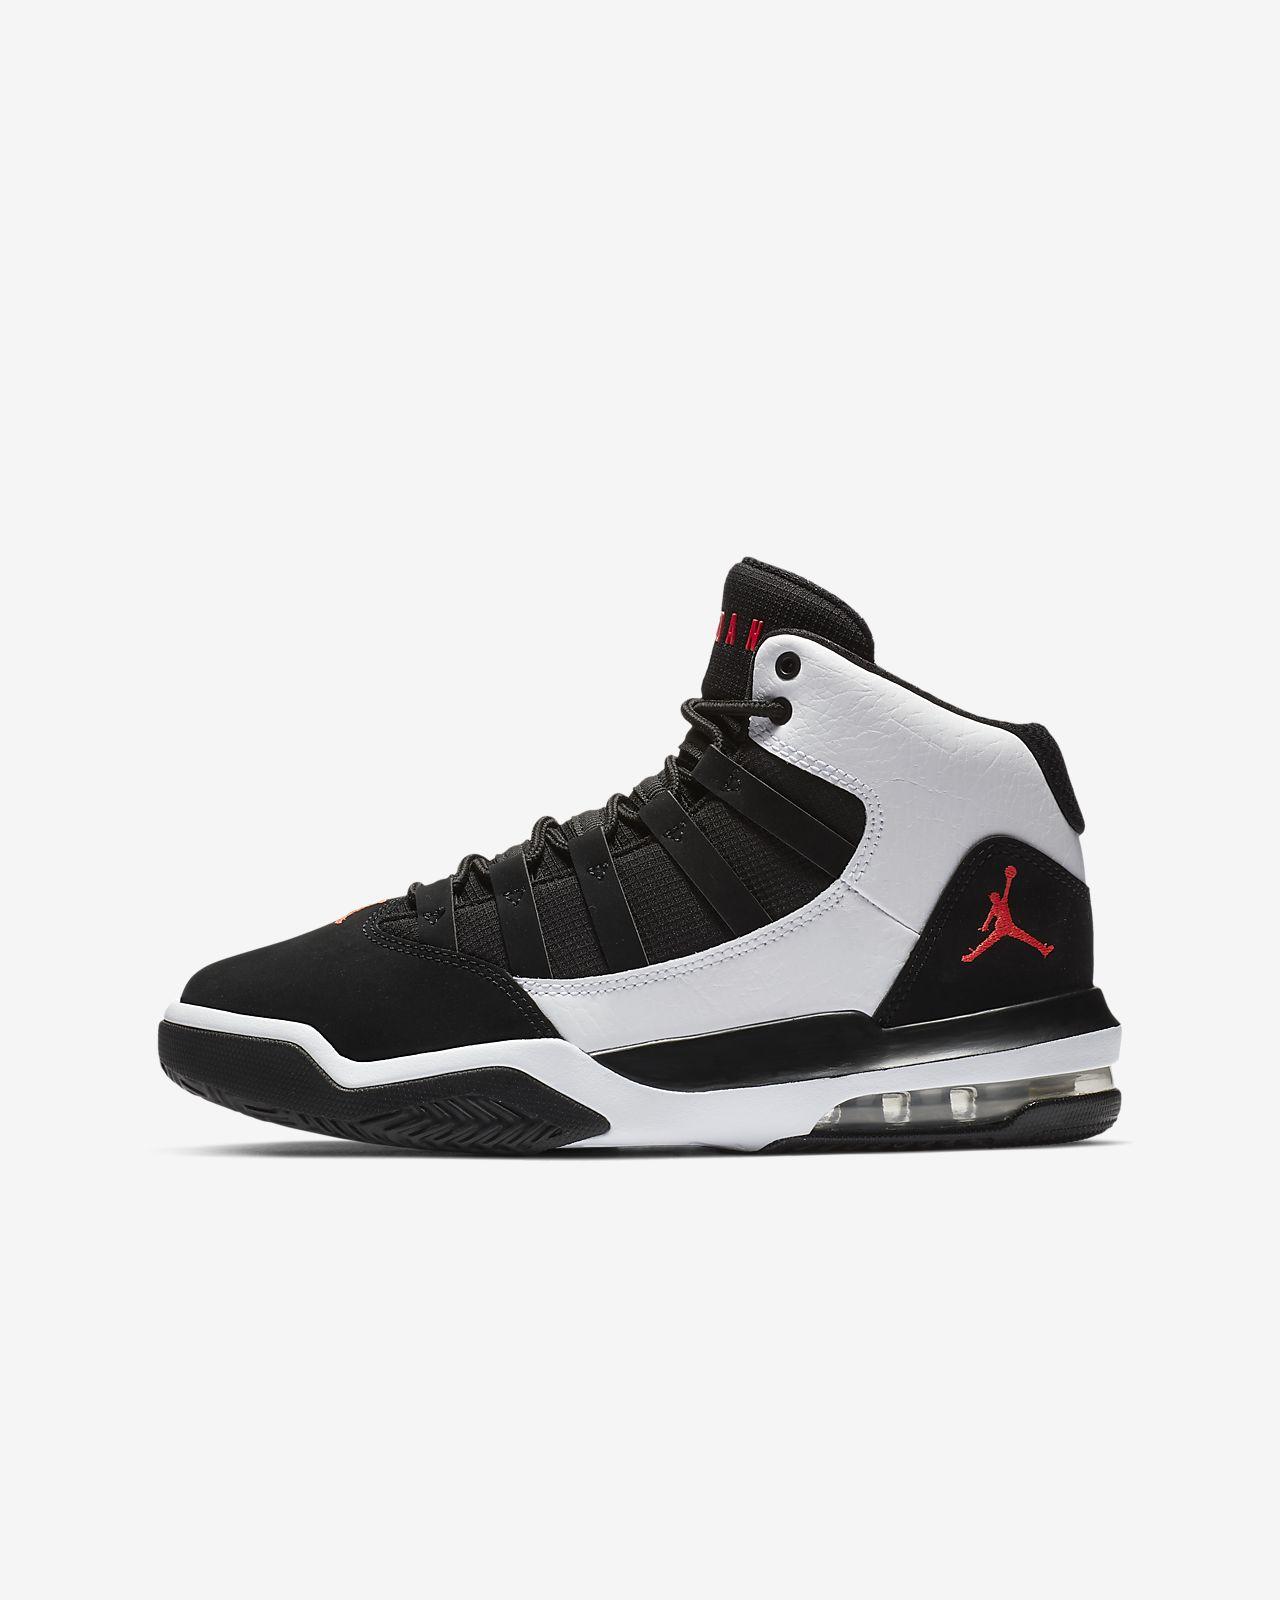 5d3e2b91d3f2 Jordan Max Aura Older Kids  Shoe. Nike.com ZA